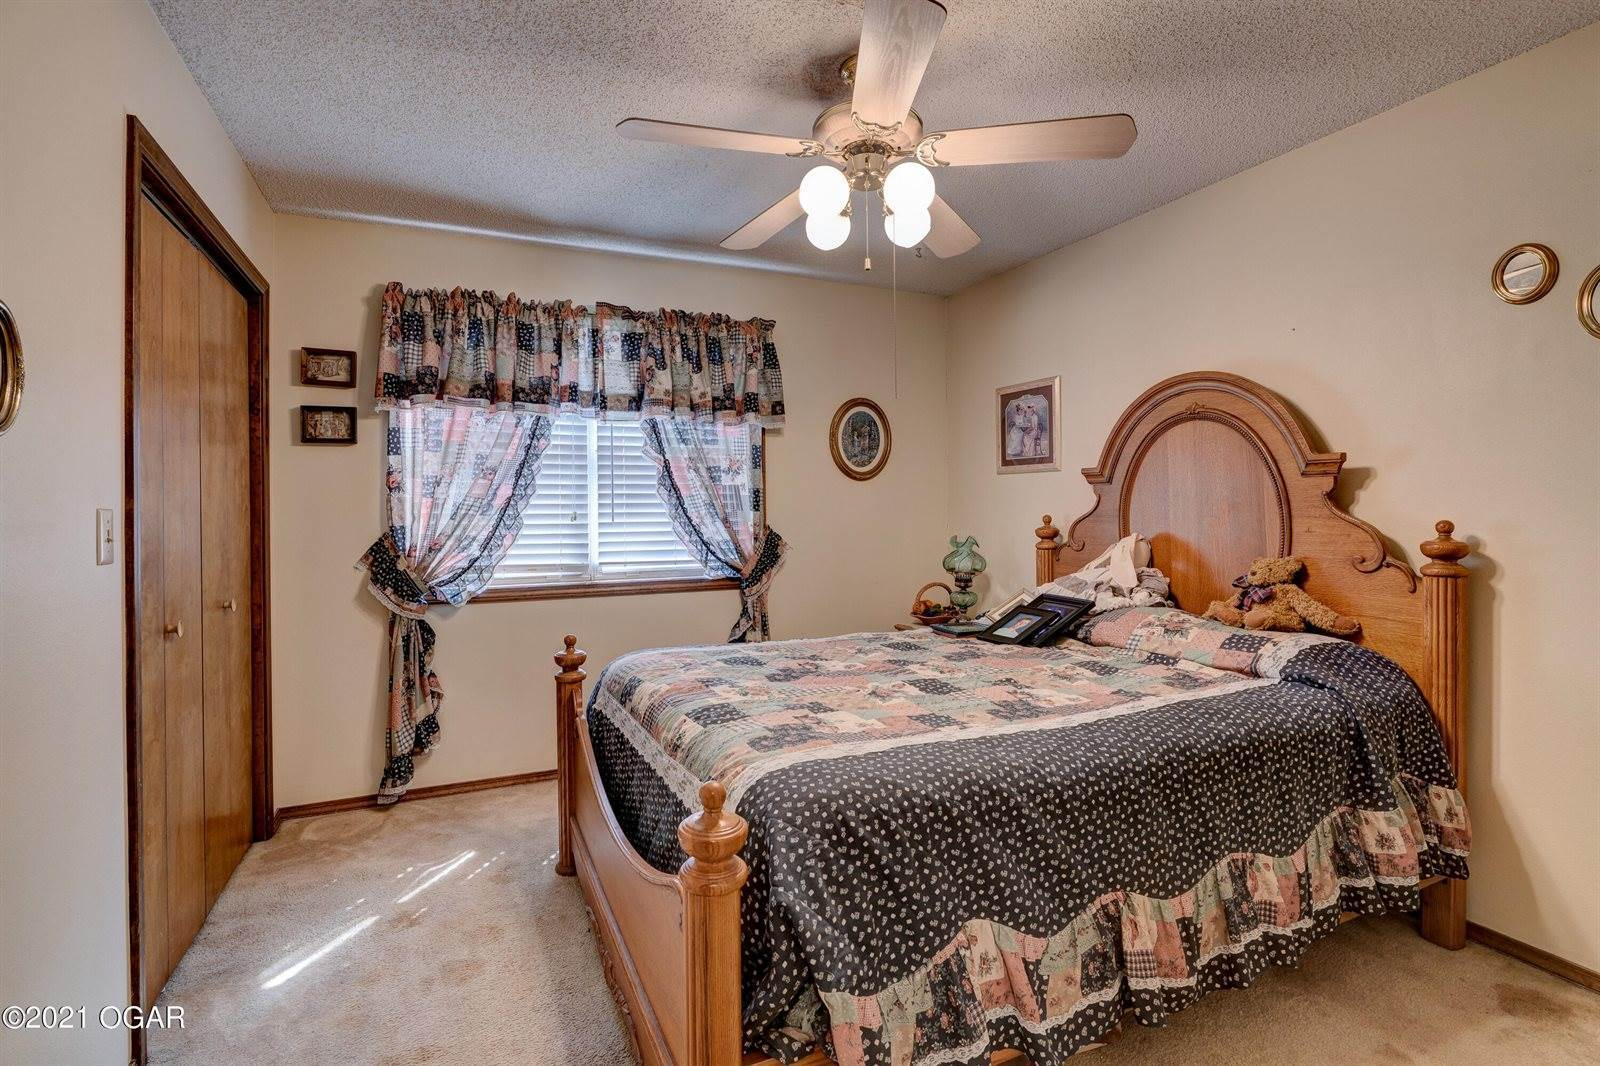 220 South College Street, Webb City, MO 64870